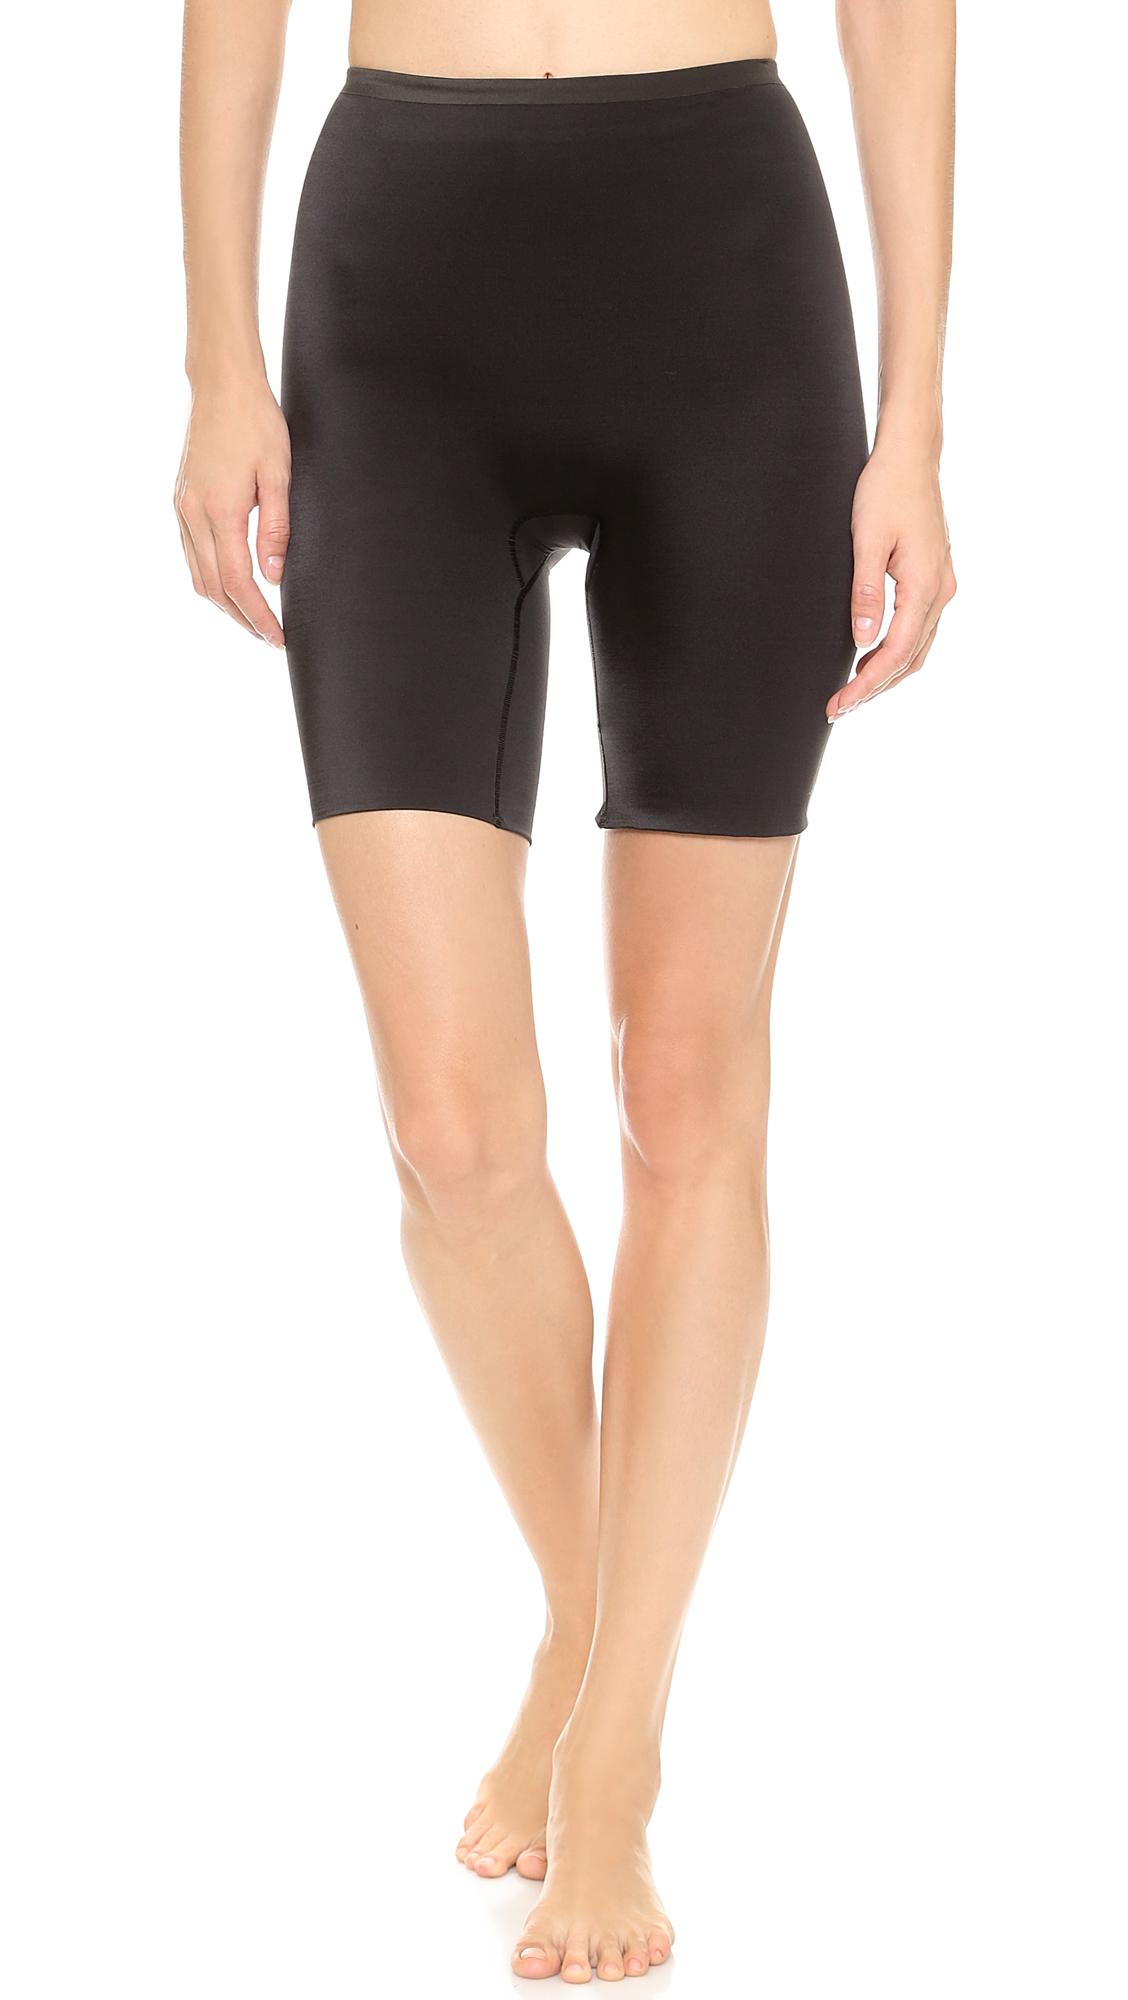 Lyst - Spanx Hide & Sleek Mid Thigh Shaper